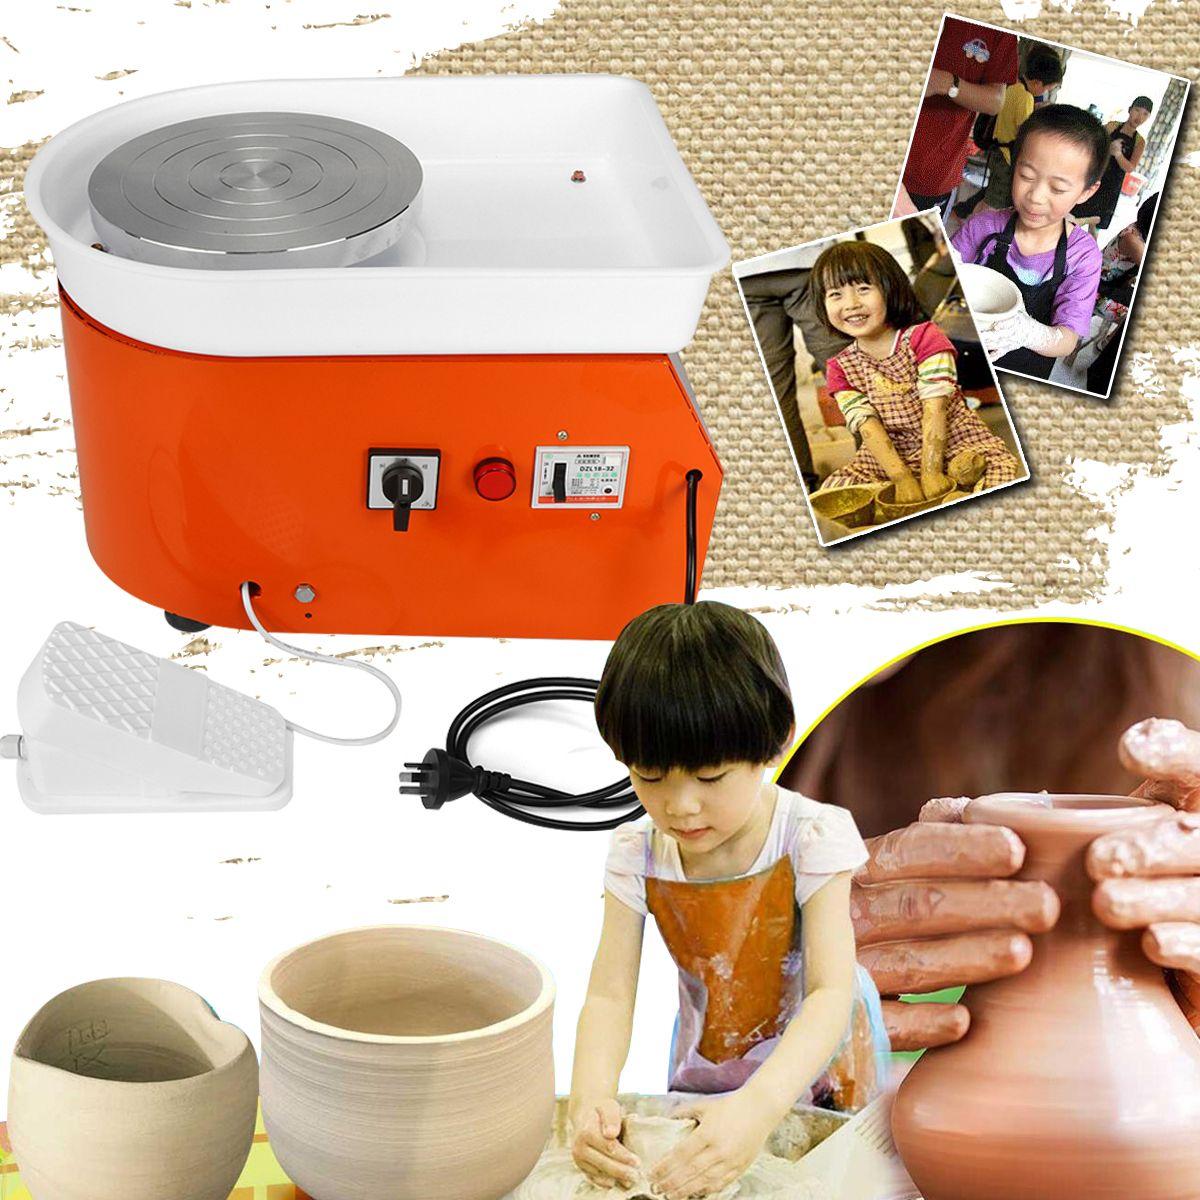 25cm Pottery Wheel Machine Ceramic Work Ceramics Clay Art EU/AU AC220V 250W With Mobile Flexible Foot Pedal Smooth Low Noise